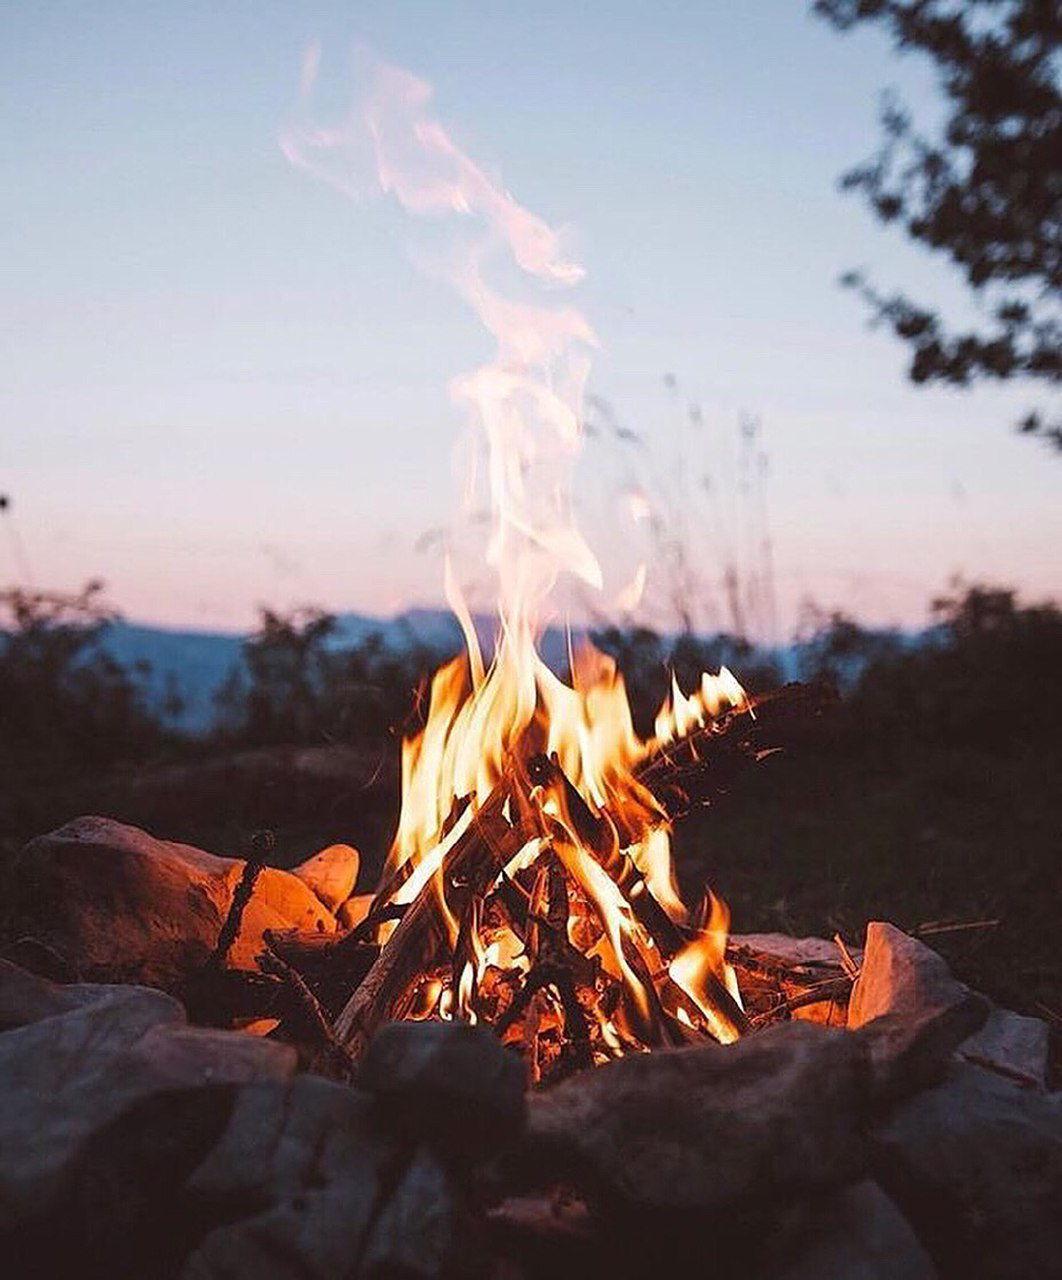 campfire glamping city